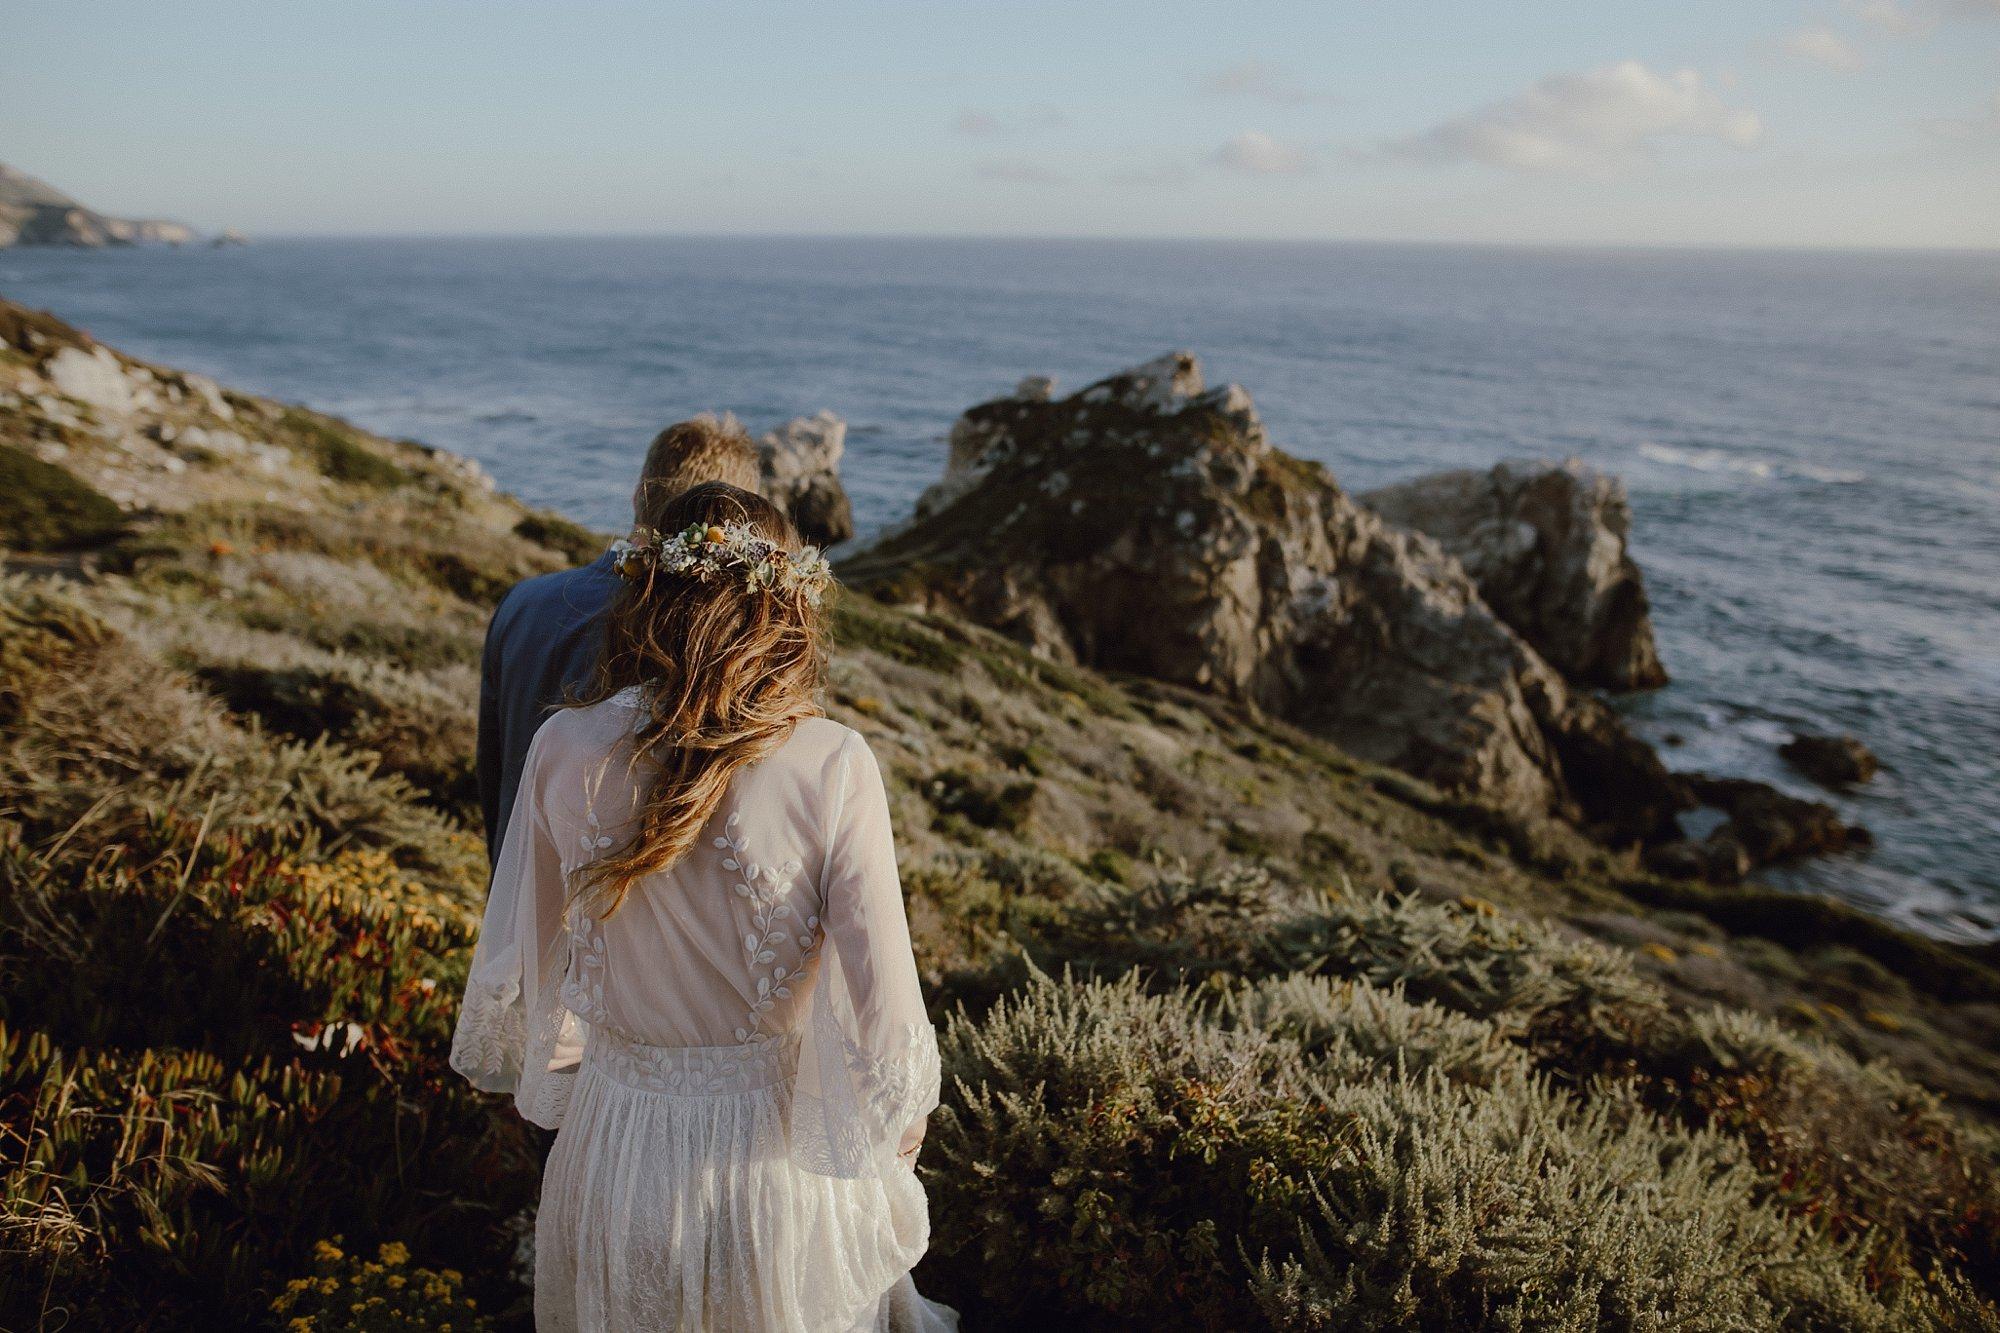 Siobhan + Ken's Wedding at Rocky Point in Big Sur, CA